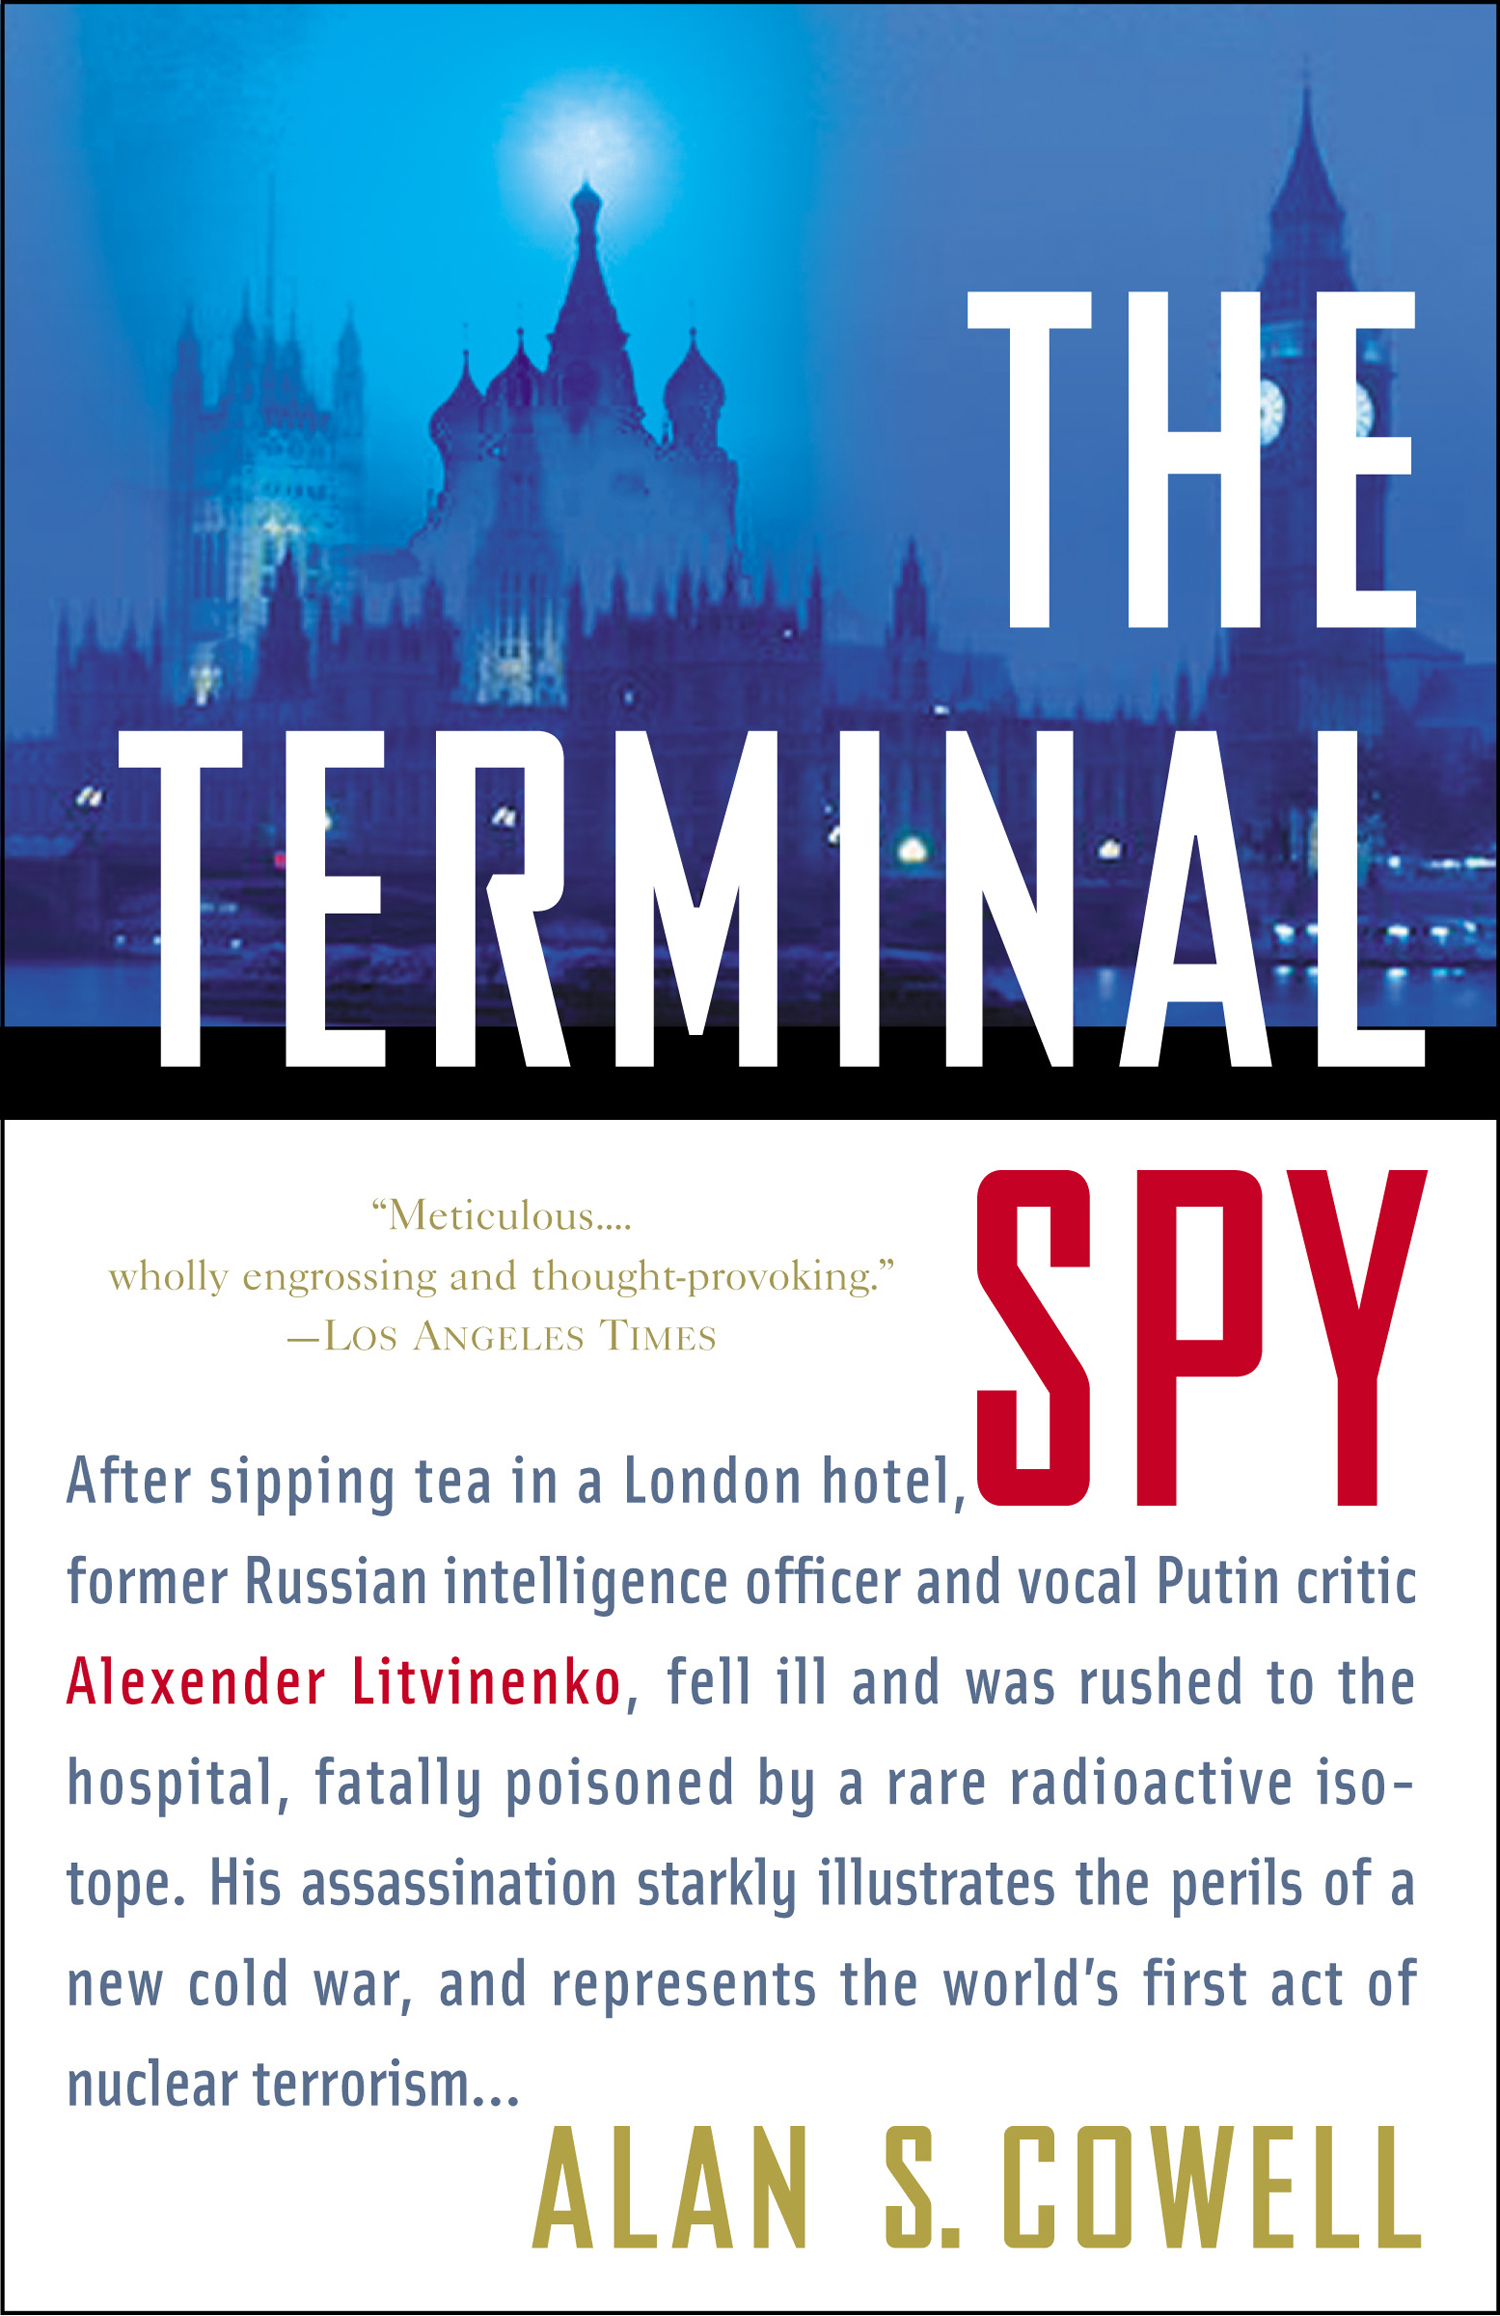 THE-TERMINAL-SPY-tpb-ss6.jpg